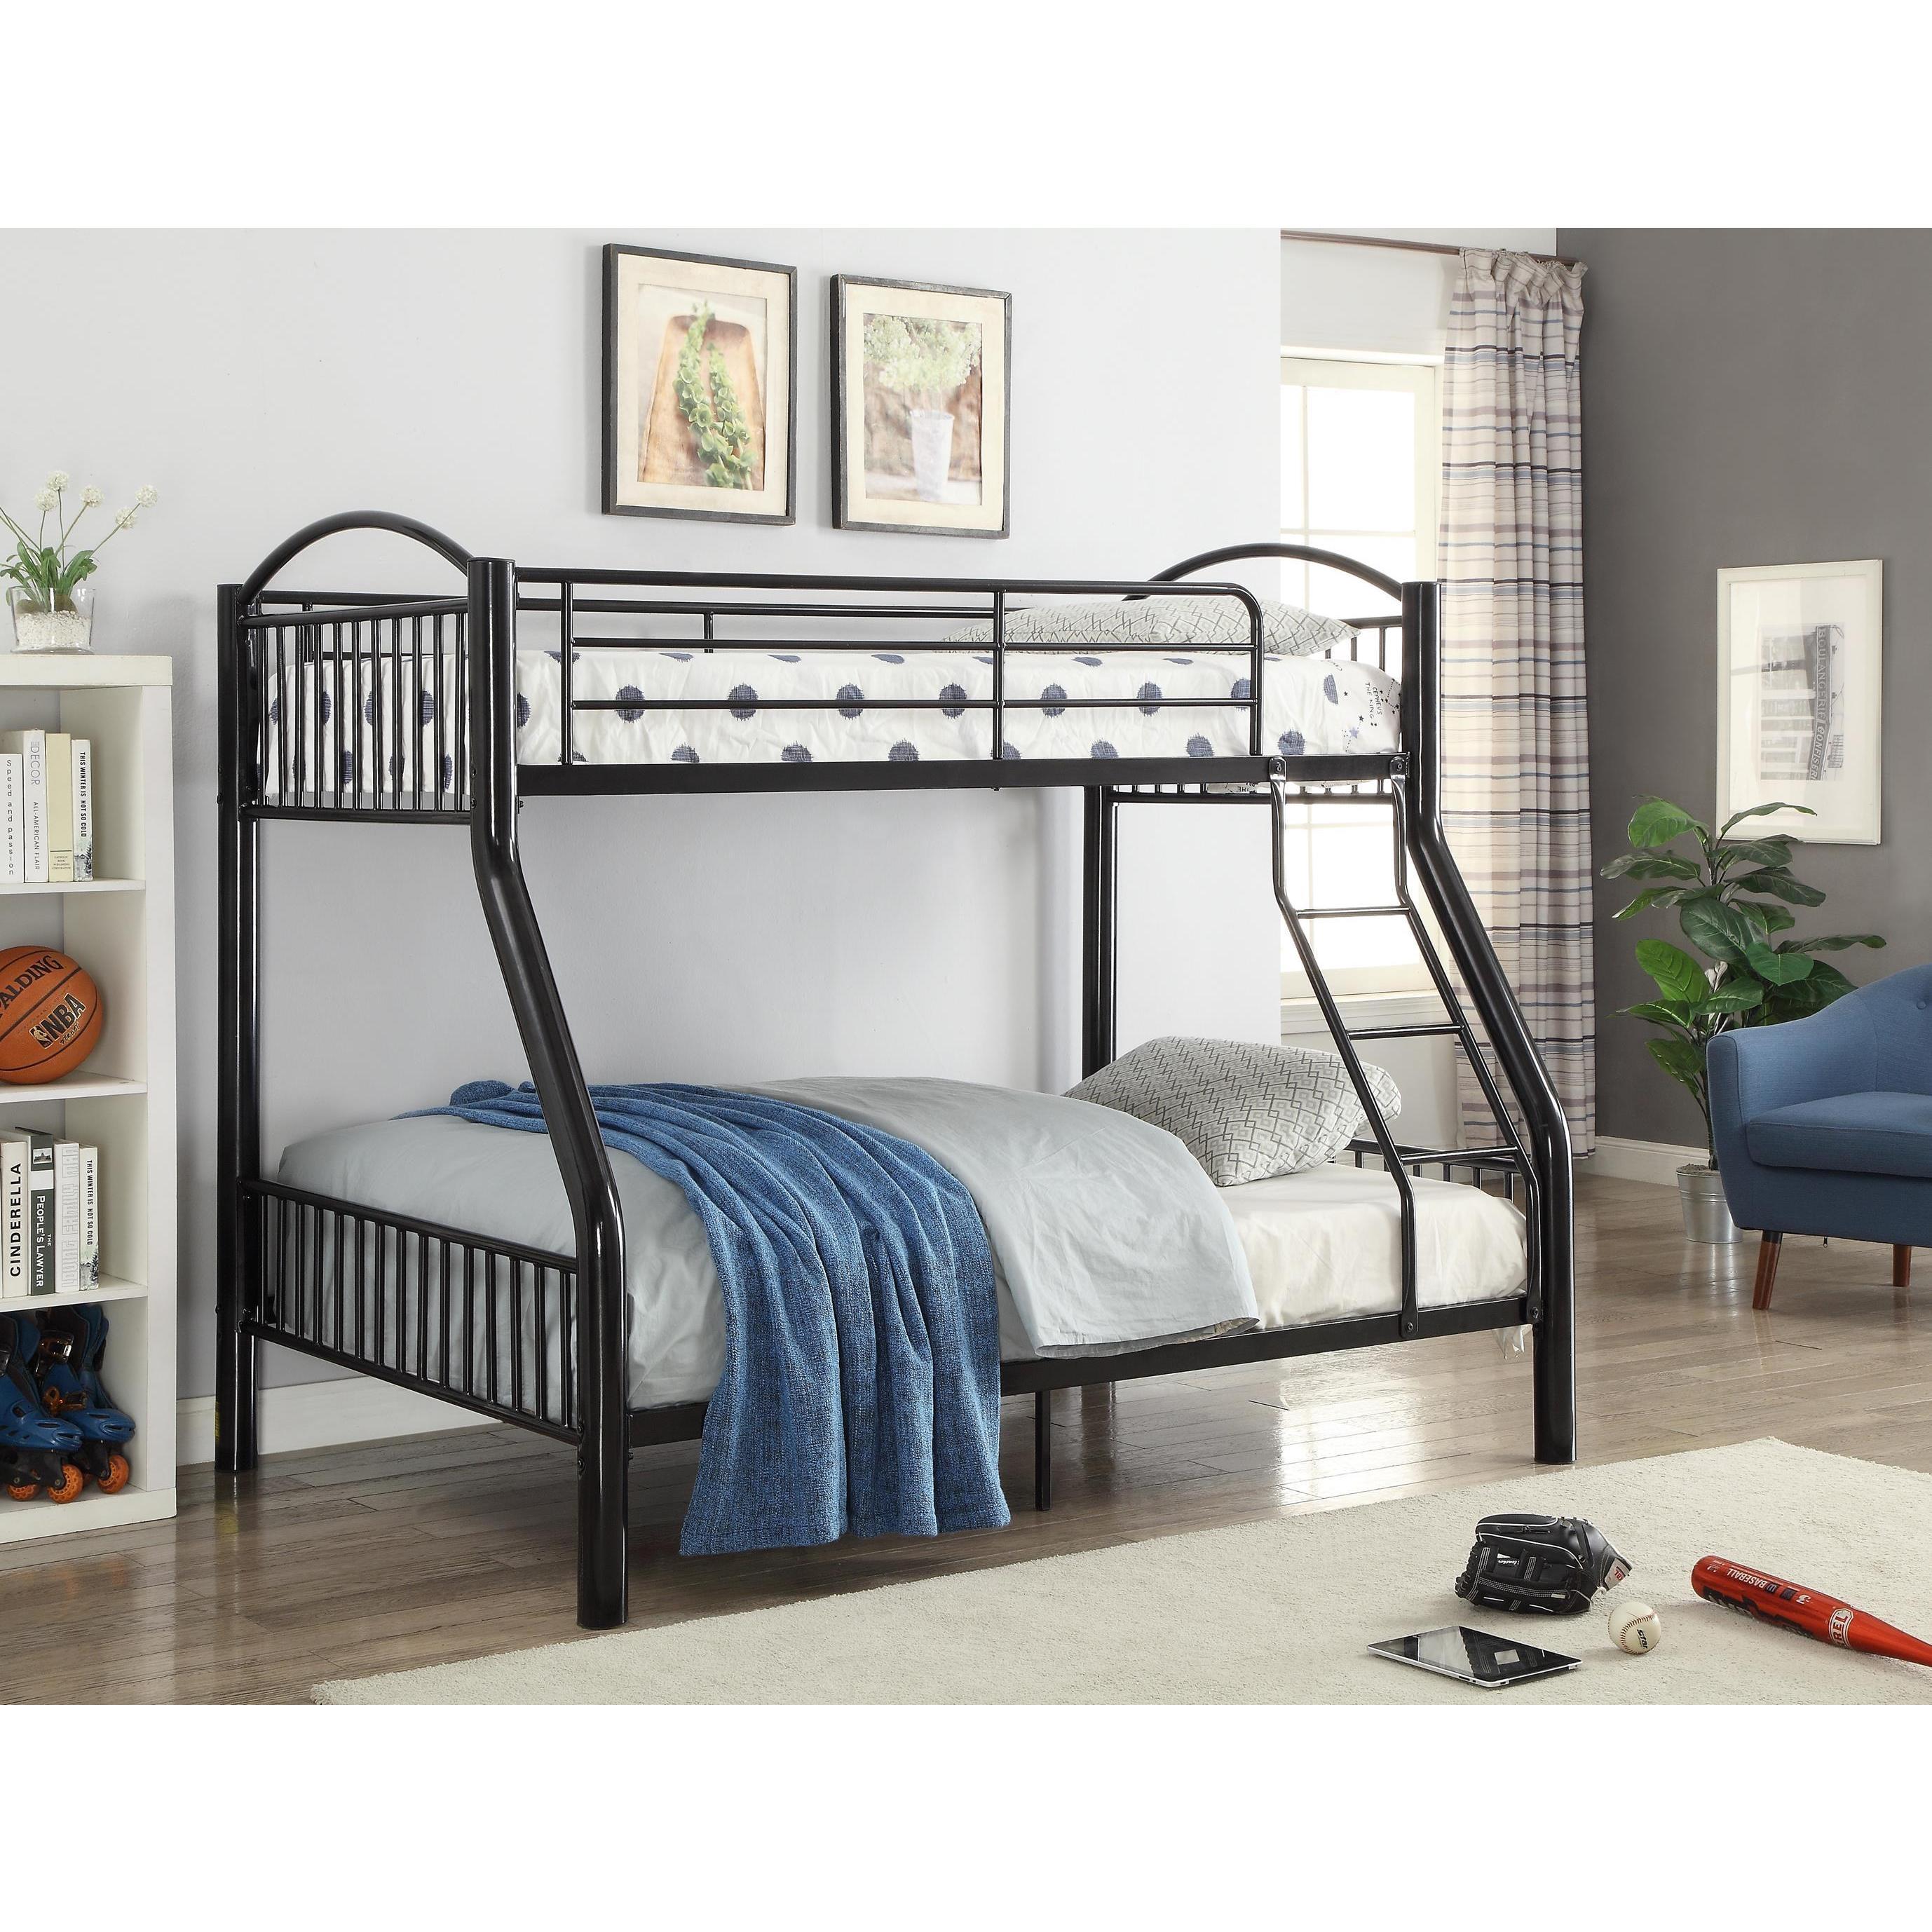 ACME Furniture Cayelynn Bunk Bed (Black - Black Finish), ...